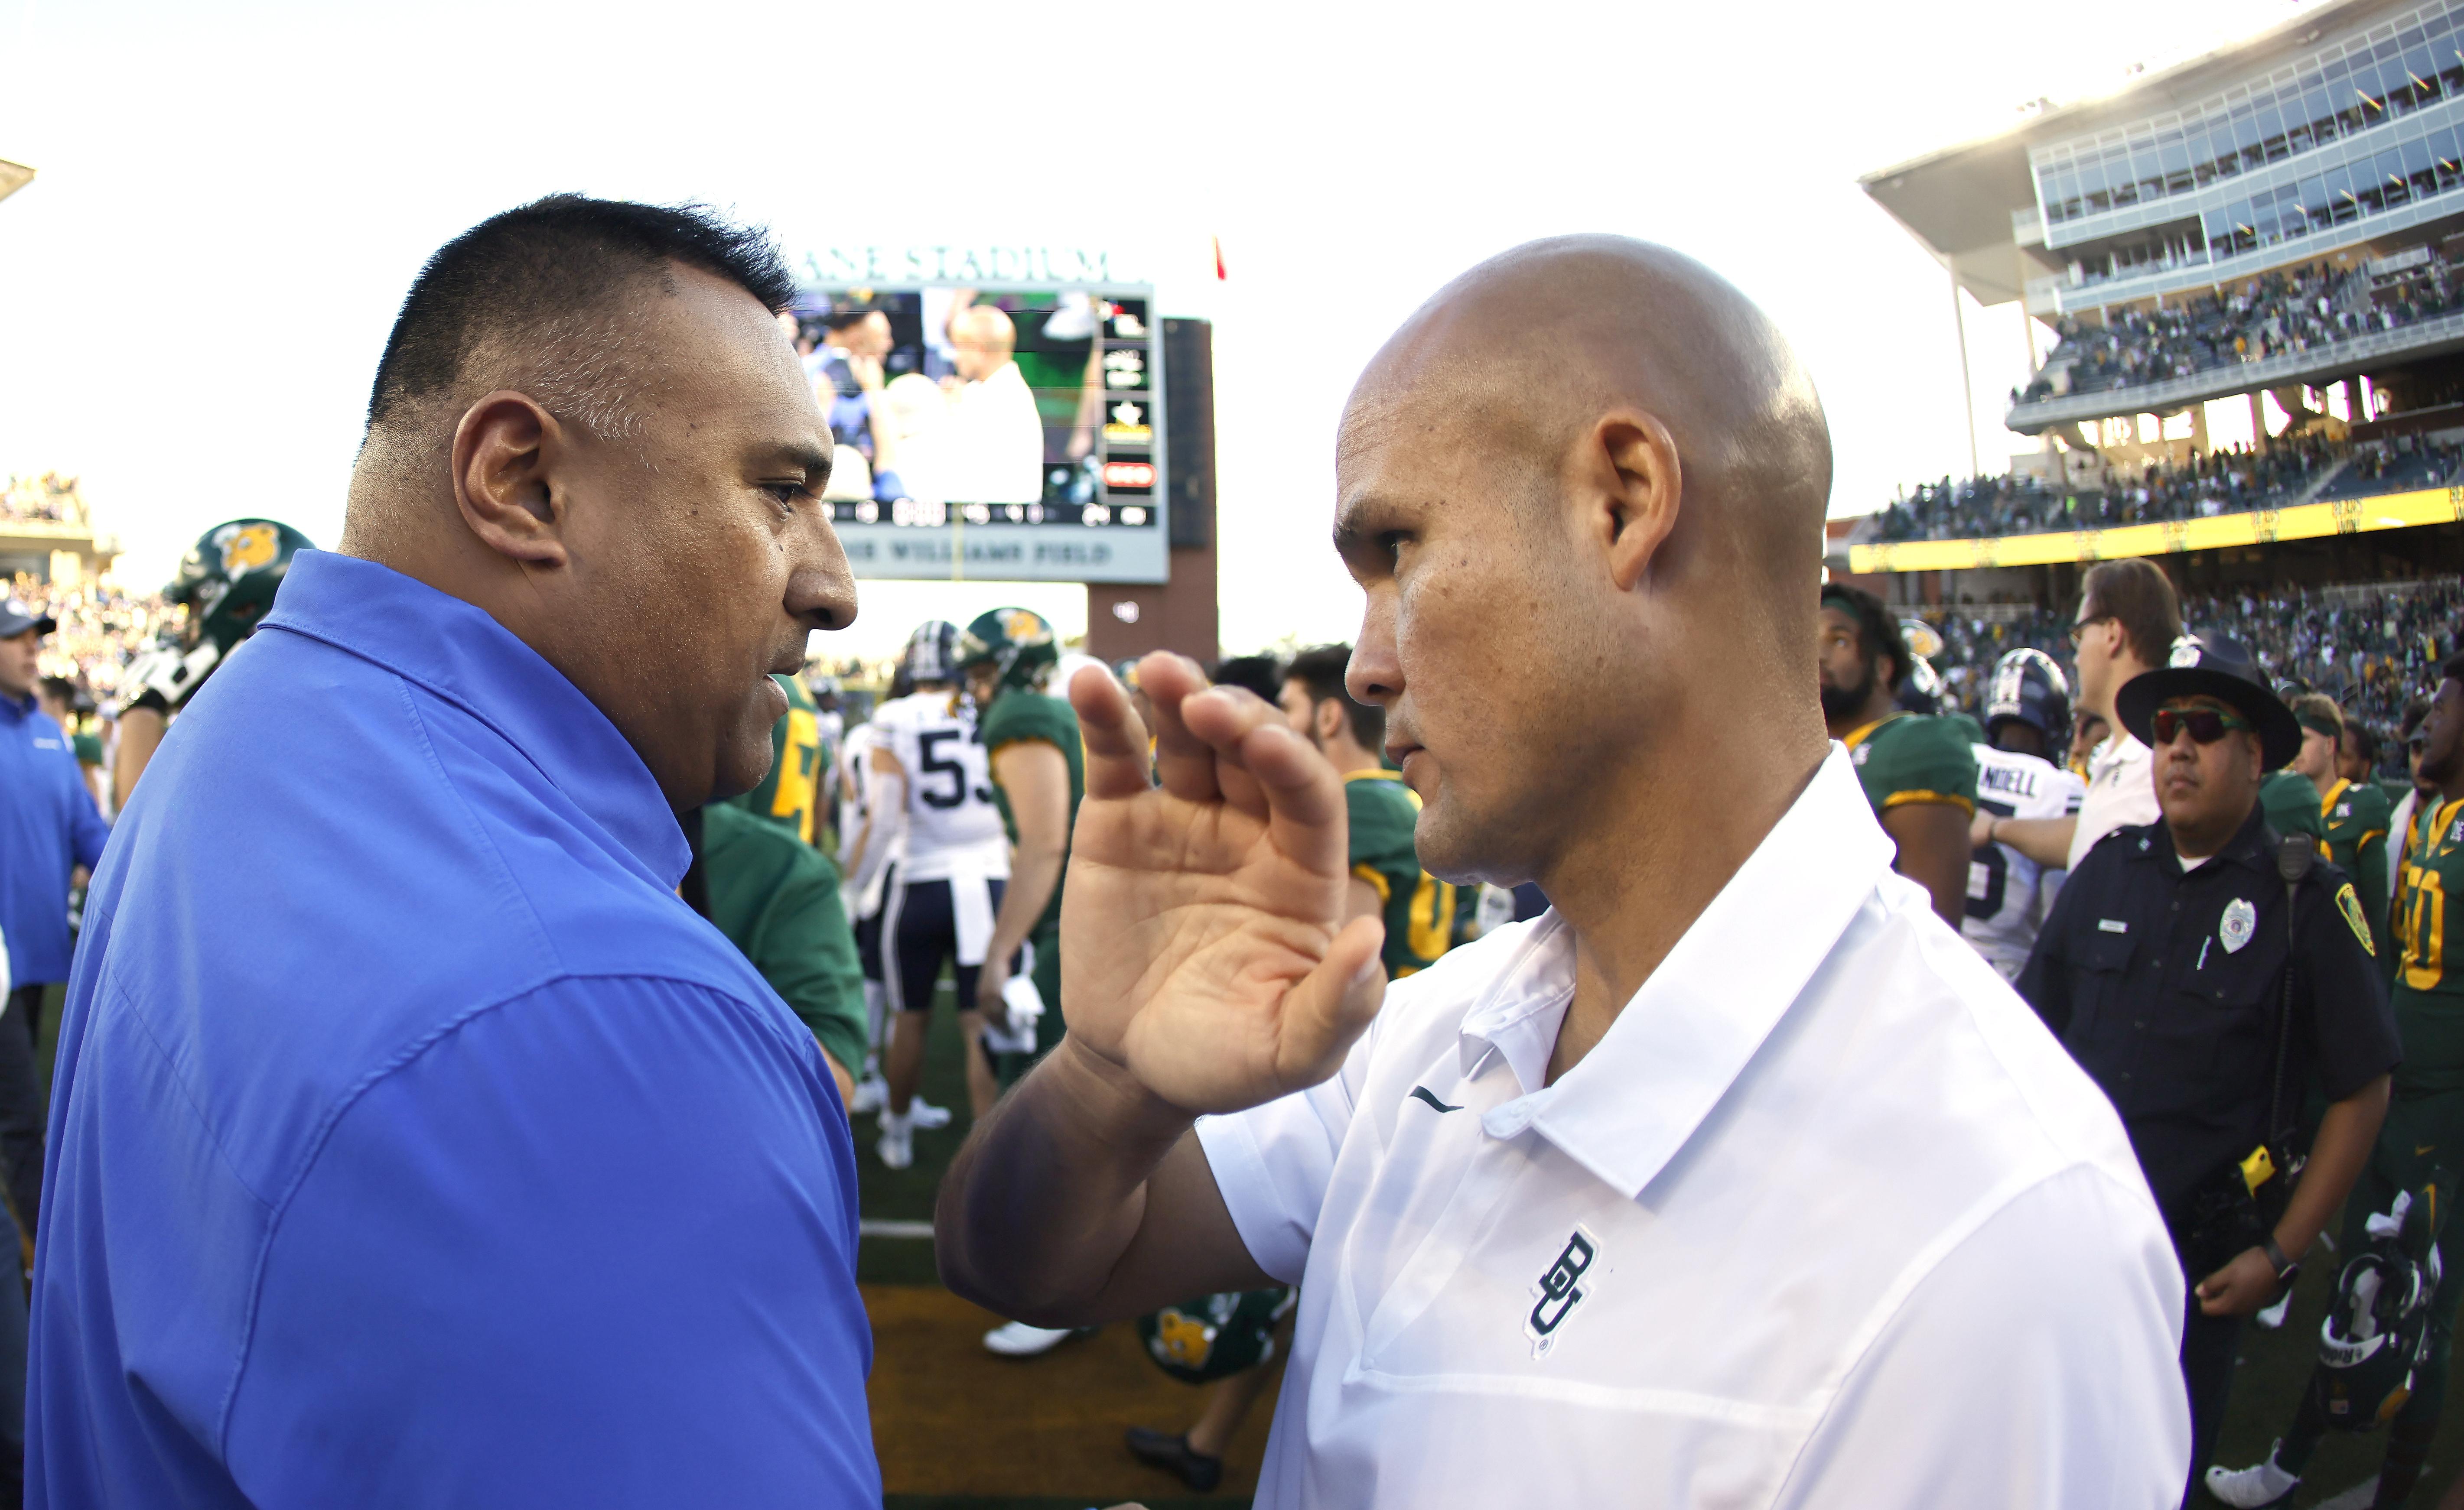 BYU head coach Kalani Sitake, left, meets Baylor head coach Dave Aranda on the field.